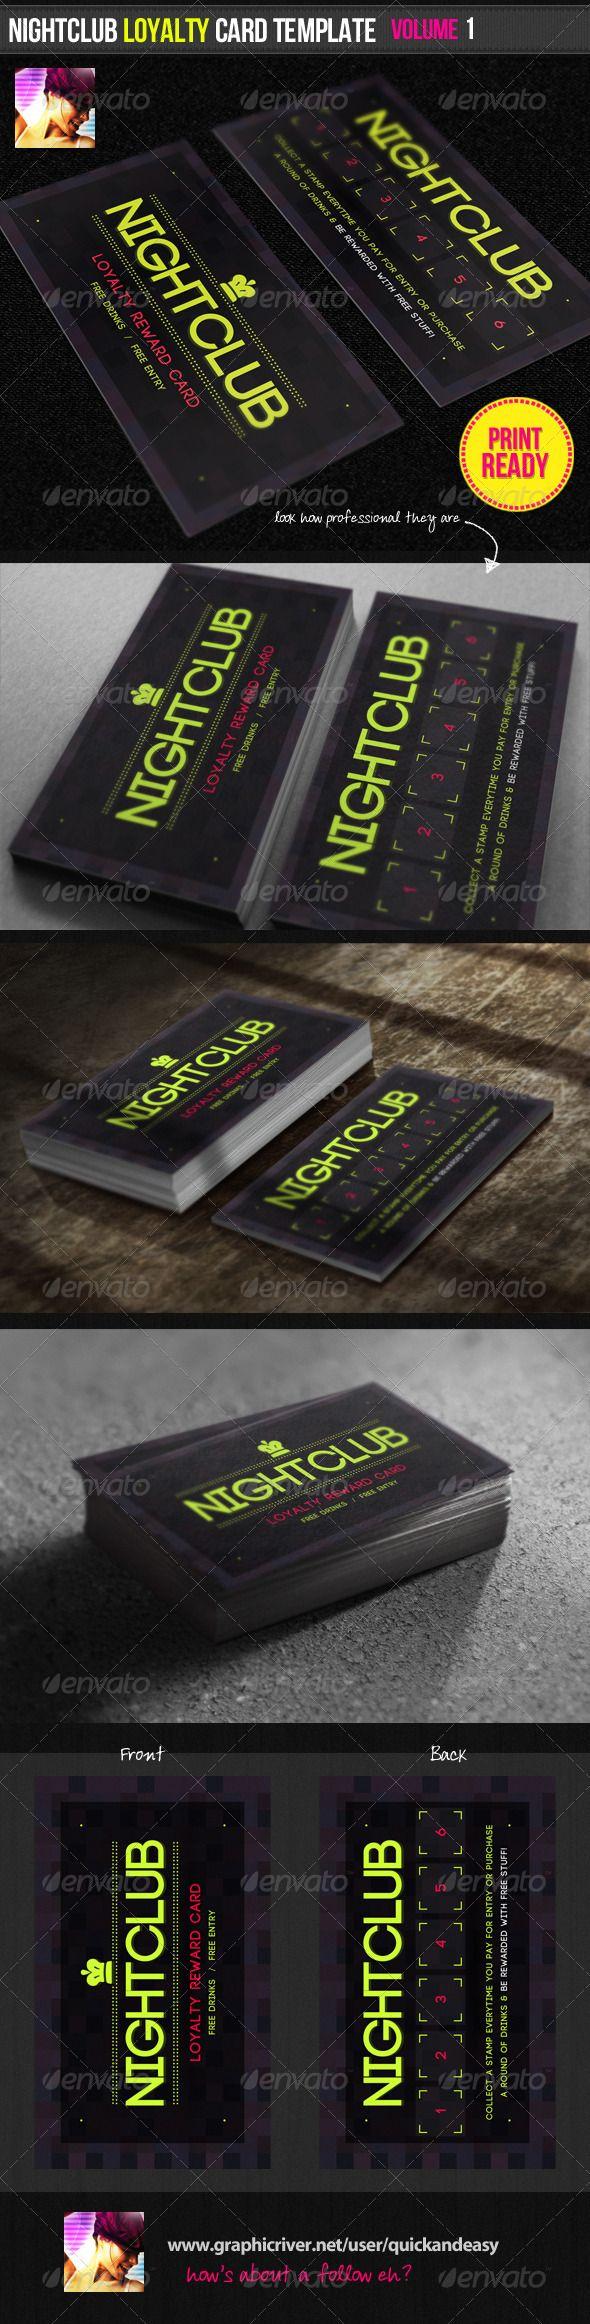 Nightclub Loyalty Card Template Loyalty Card Template Loyalty Card Design Card Template